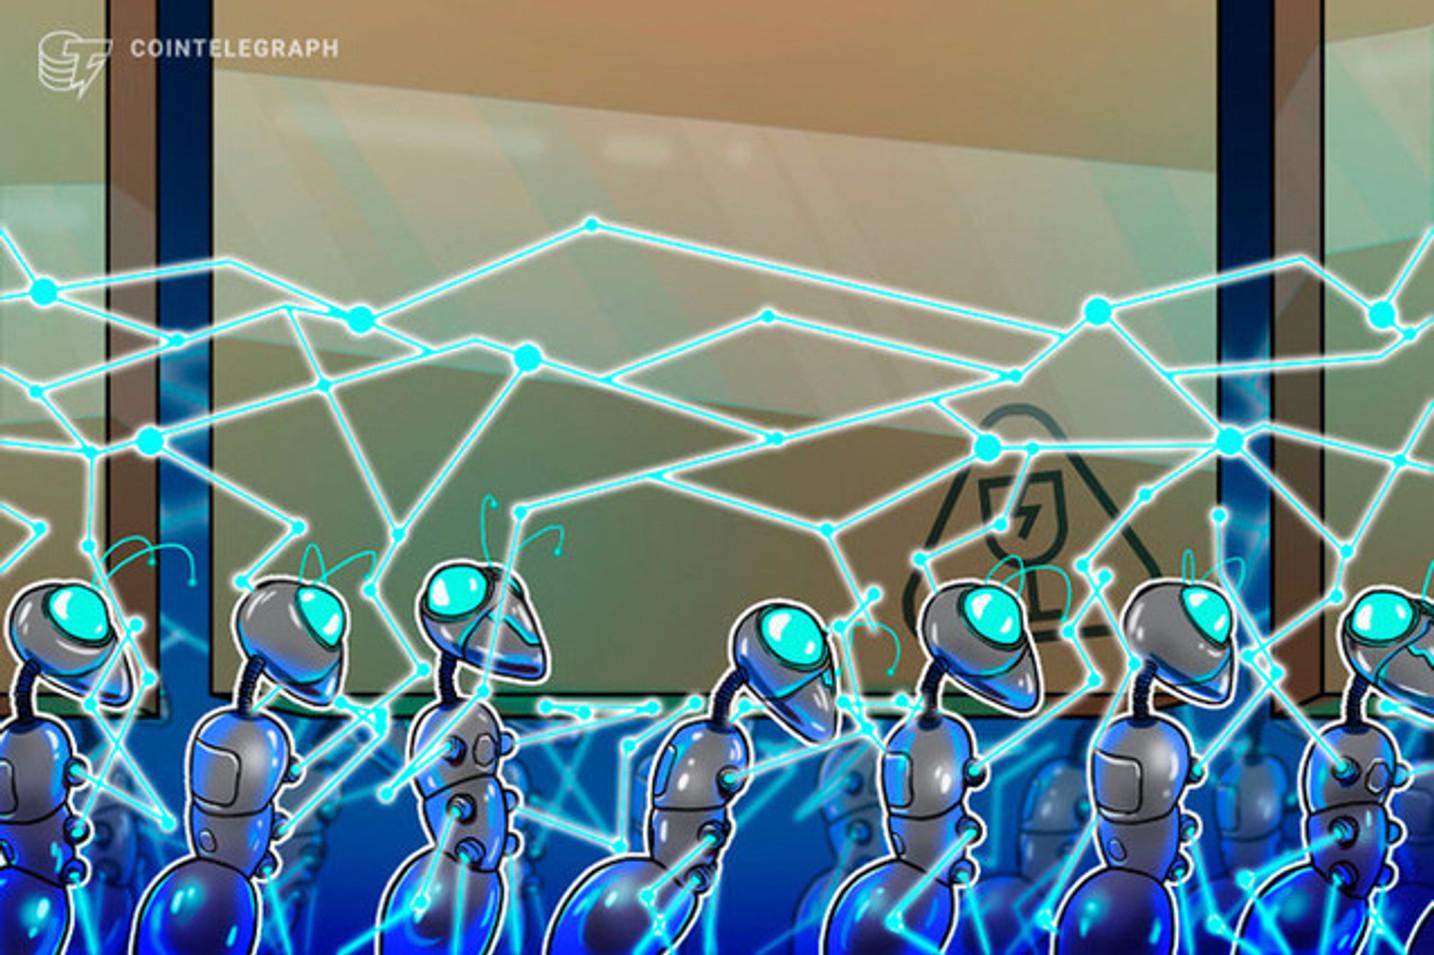 Se completó primer envío internacional de langosta con Blockchain desde Australia hasta China